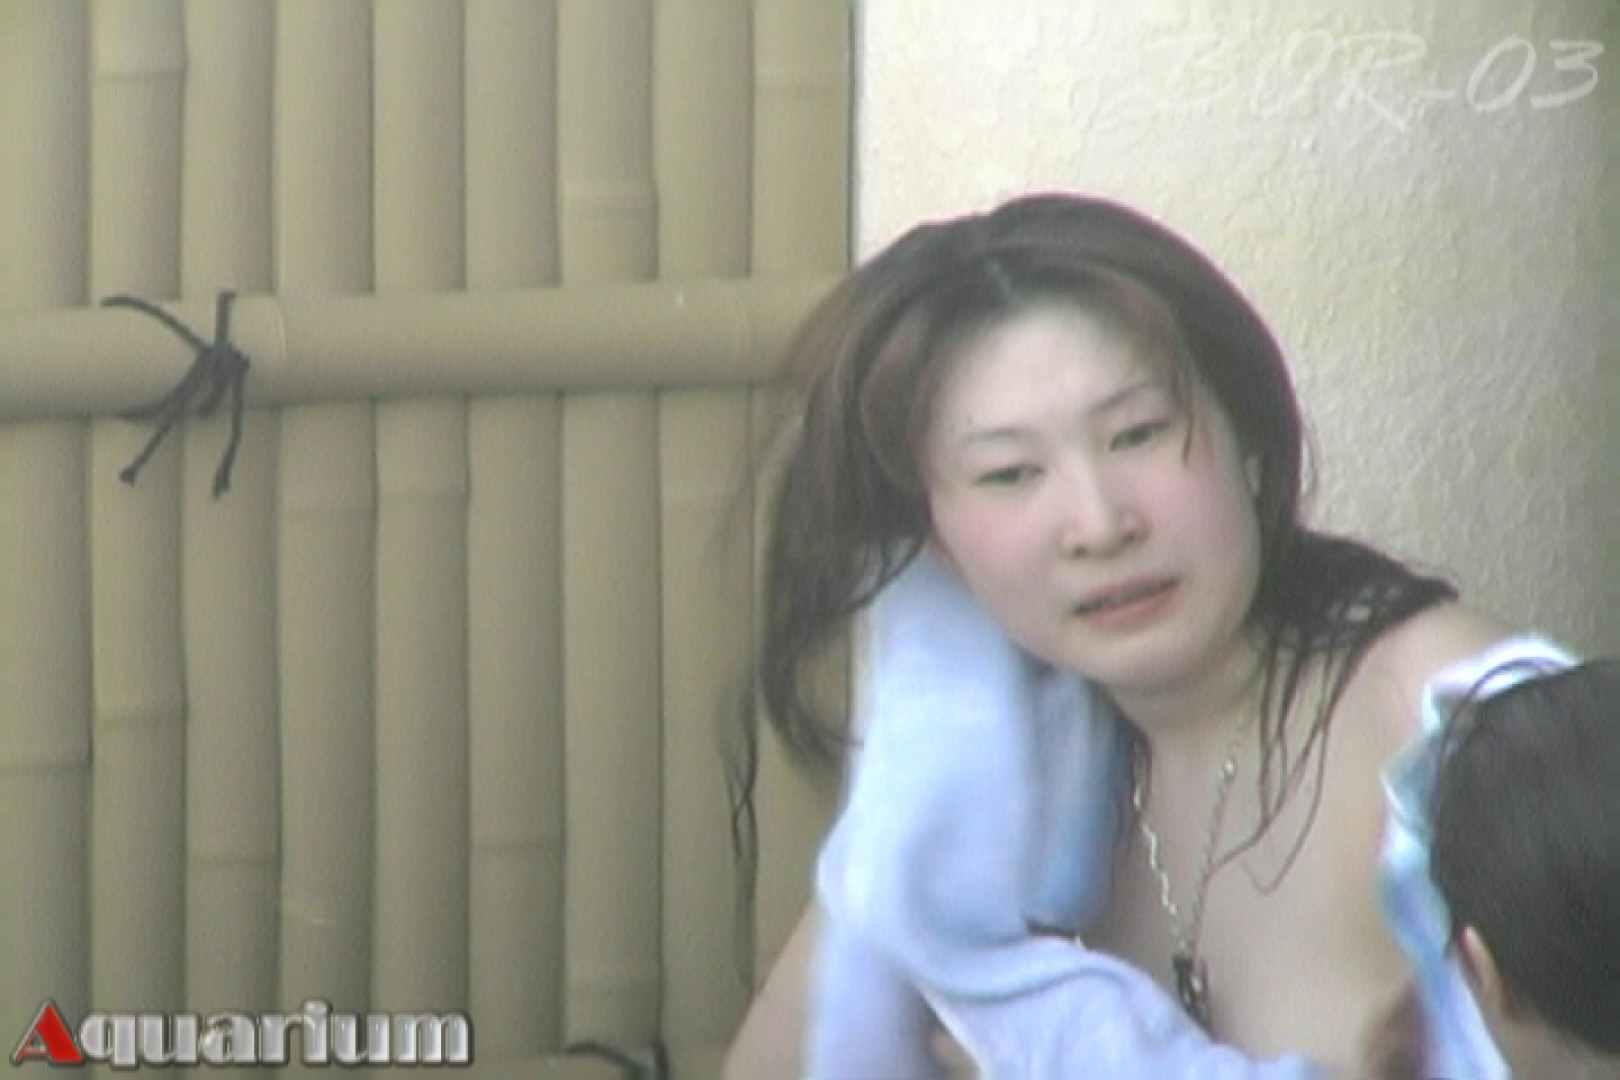 Aquaな露天風呂Vol.486 盗撮師作品  69pic 60